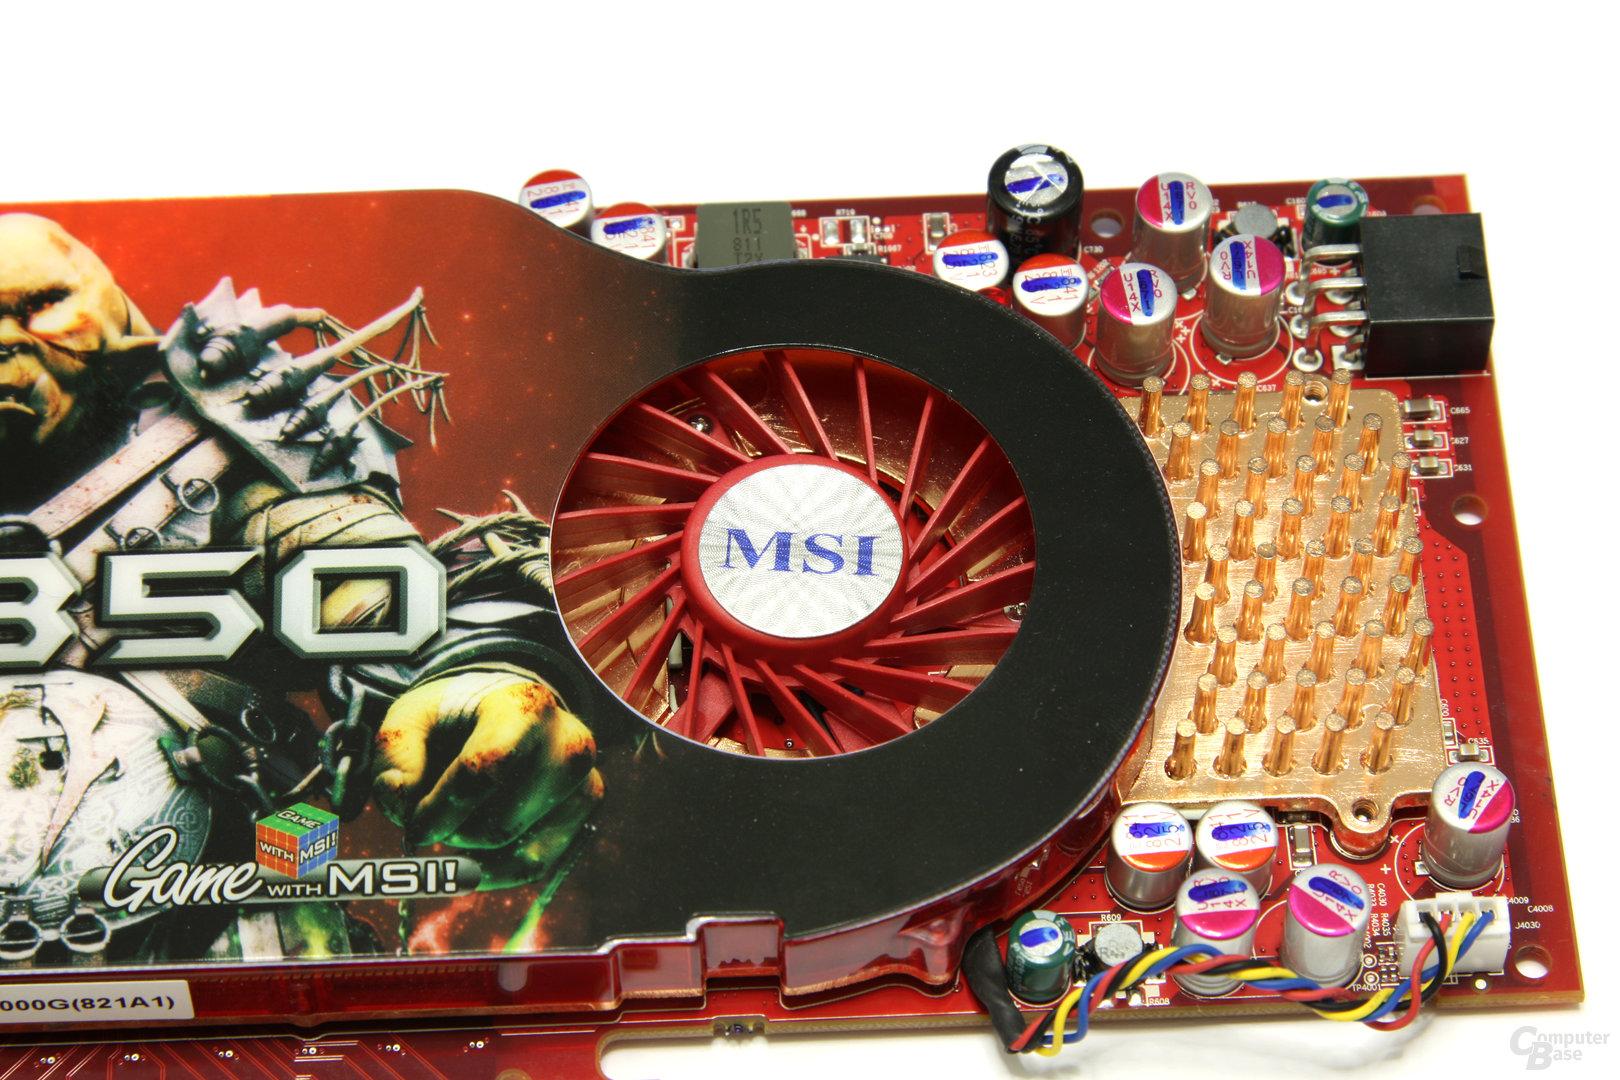 Radeon HD 4850 Lüfter